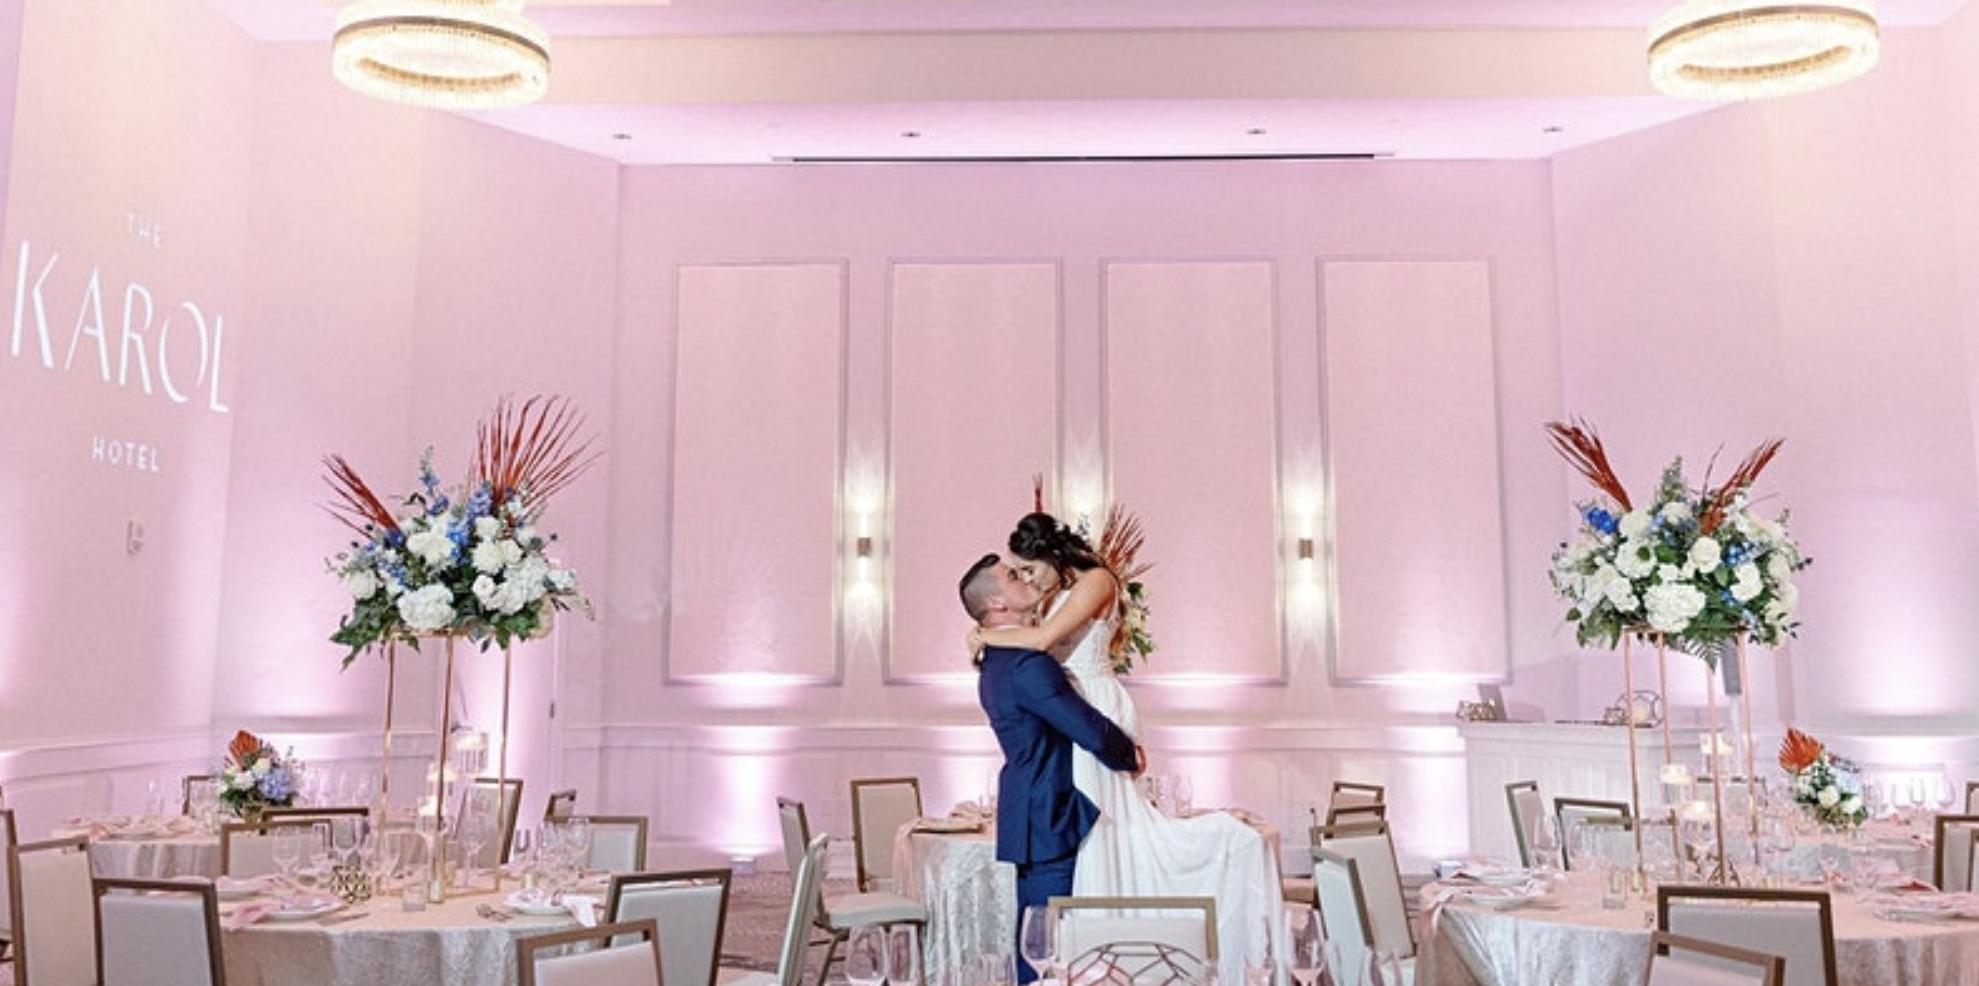 Karol Hotel Wedding Showcase